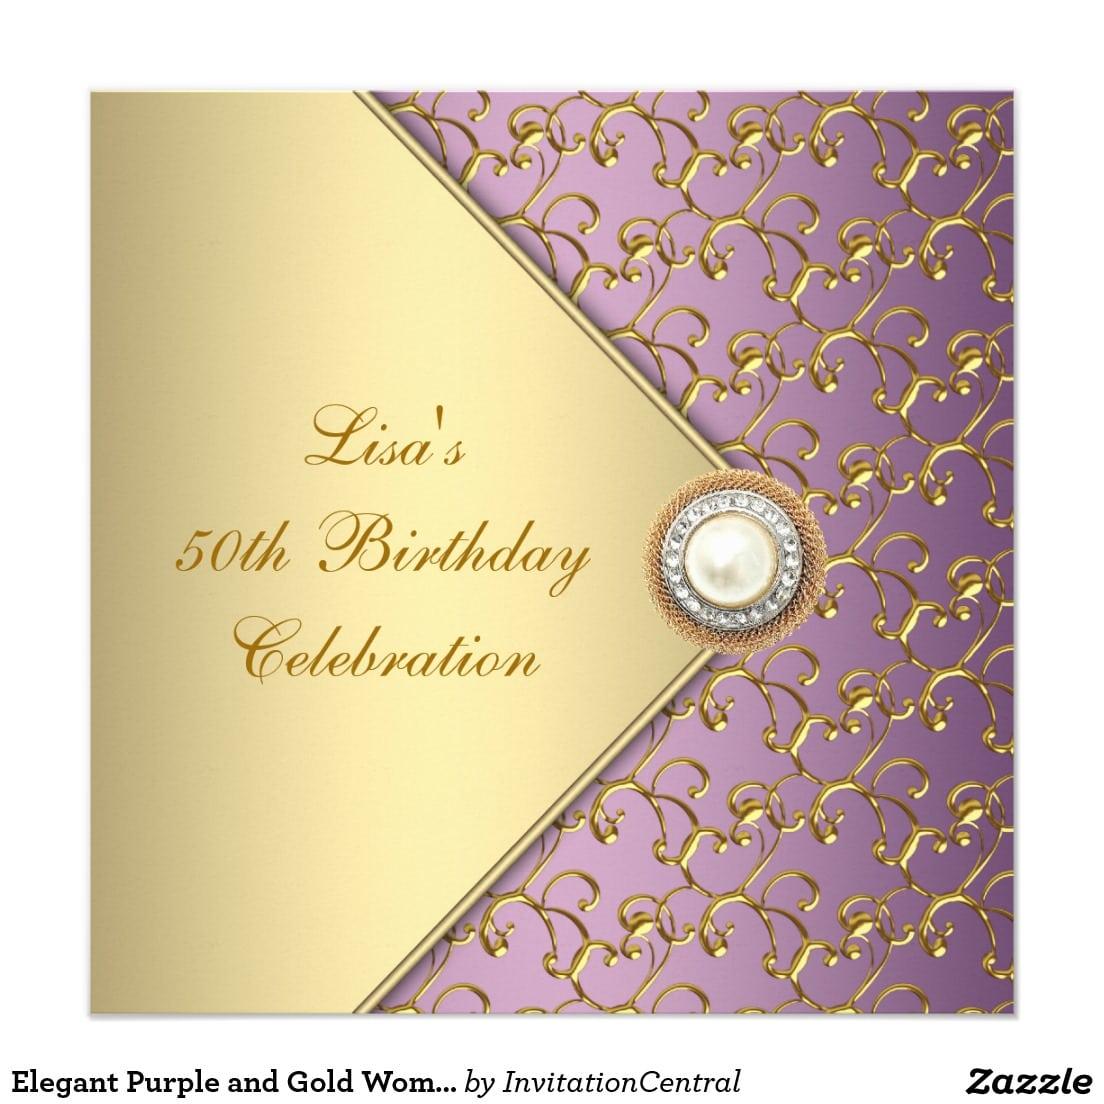 Elegant 50th Birthday Party Red Black Gold Damask Card